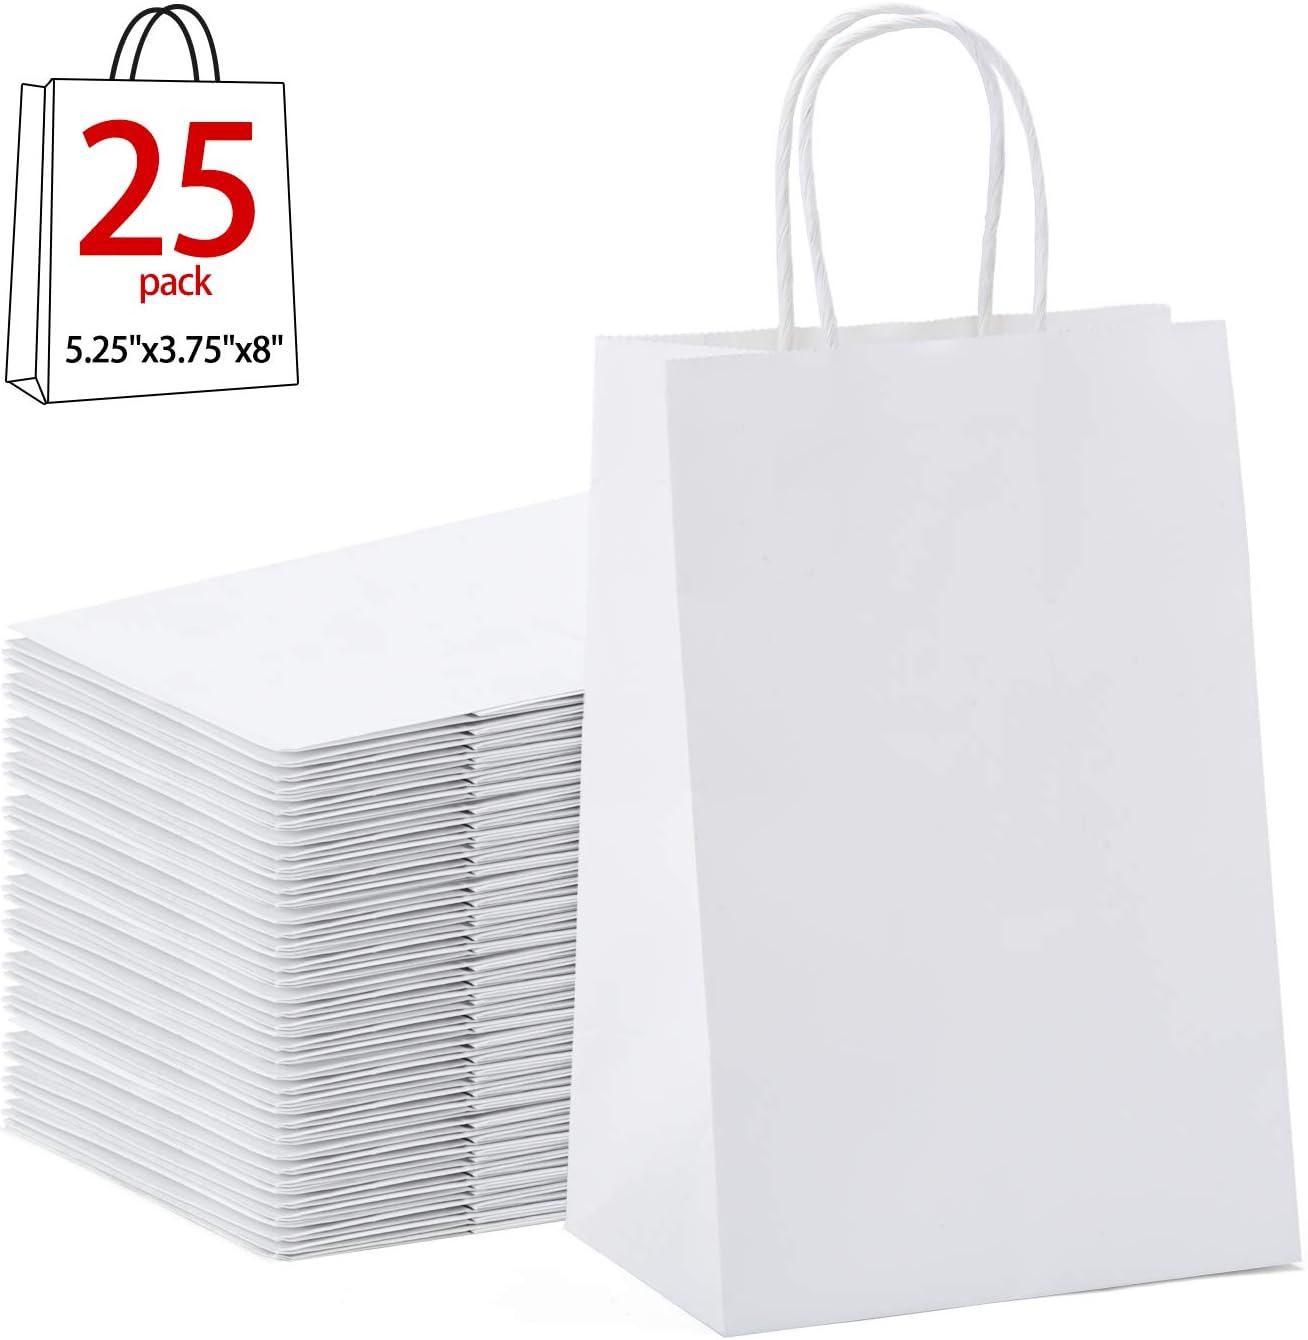 Halulu - Bolsas de papel de estraza de color blanco. Bolsas de regalo con asas. 25 unidades de 12,7 x 9,52 x 20,32 cm